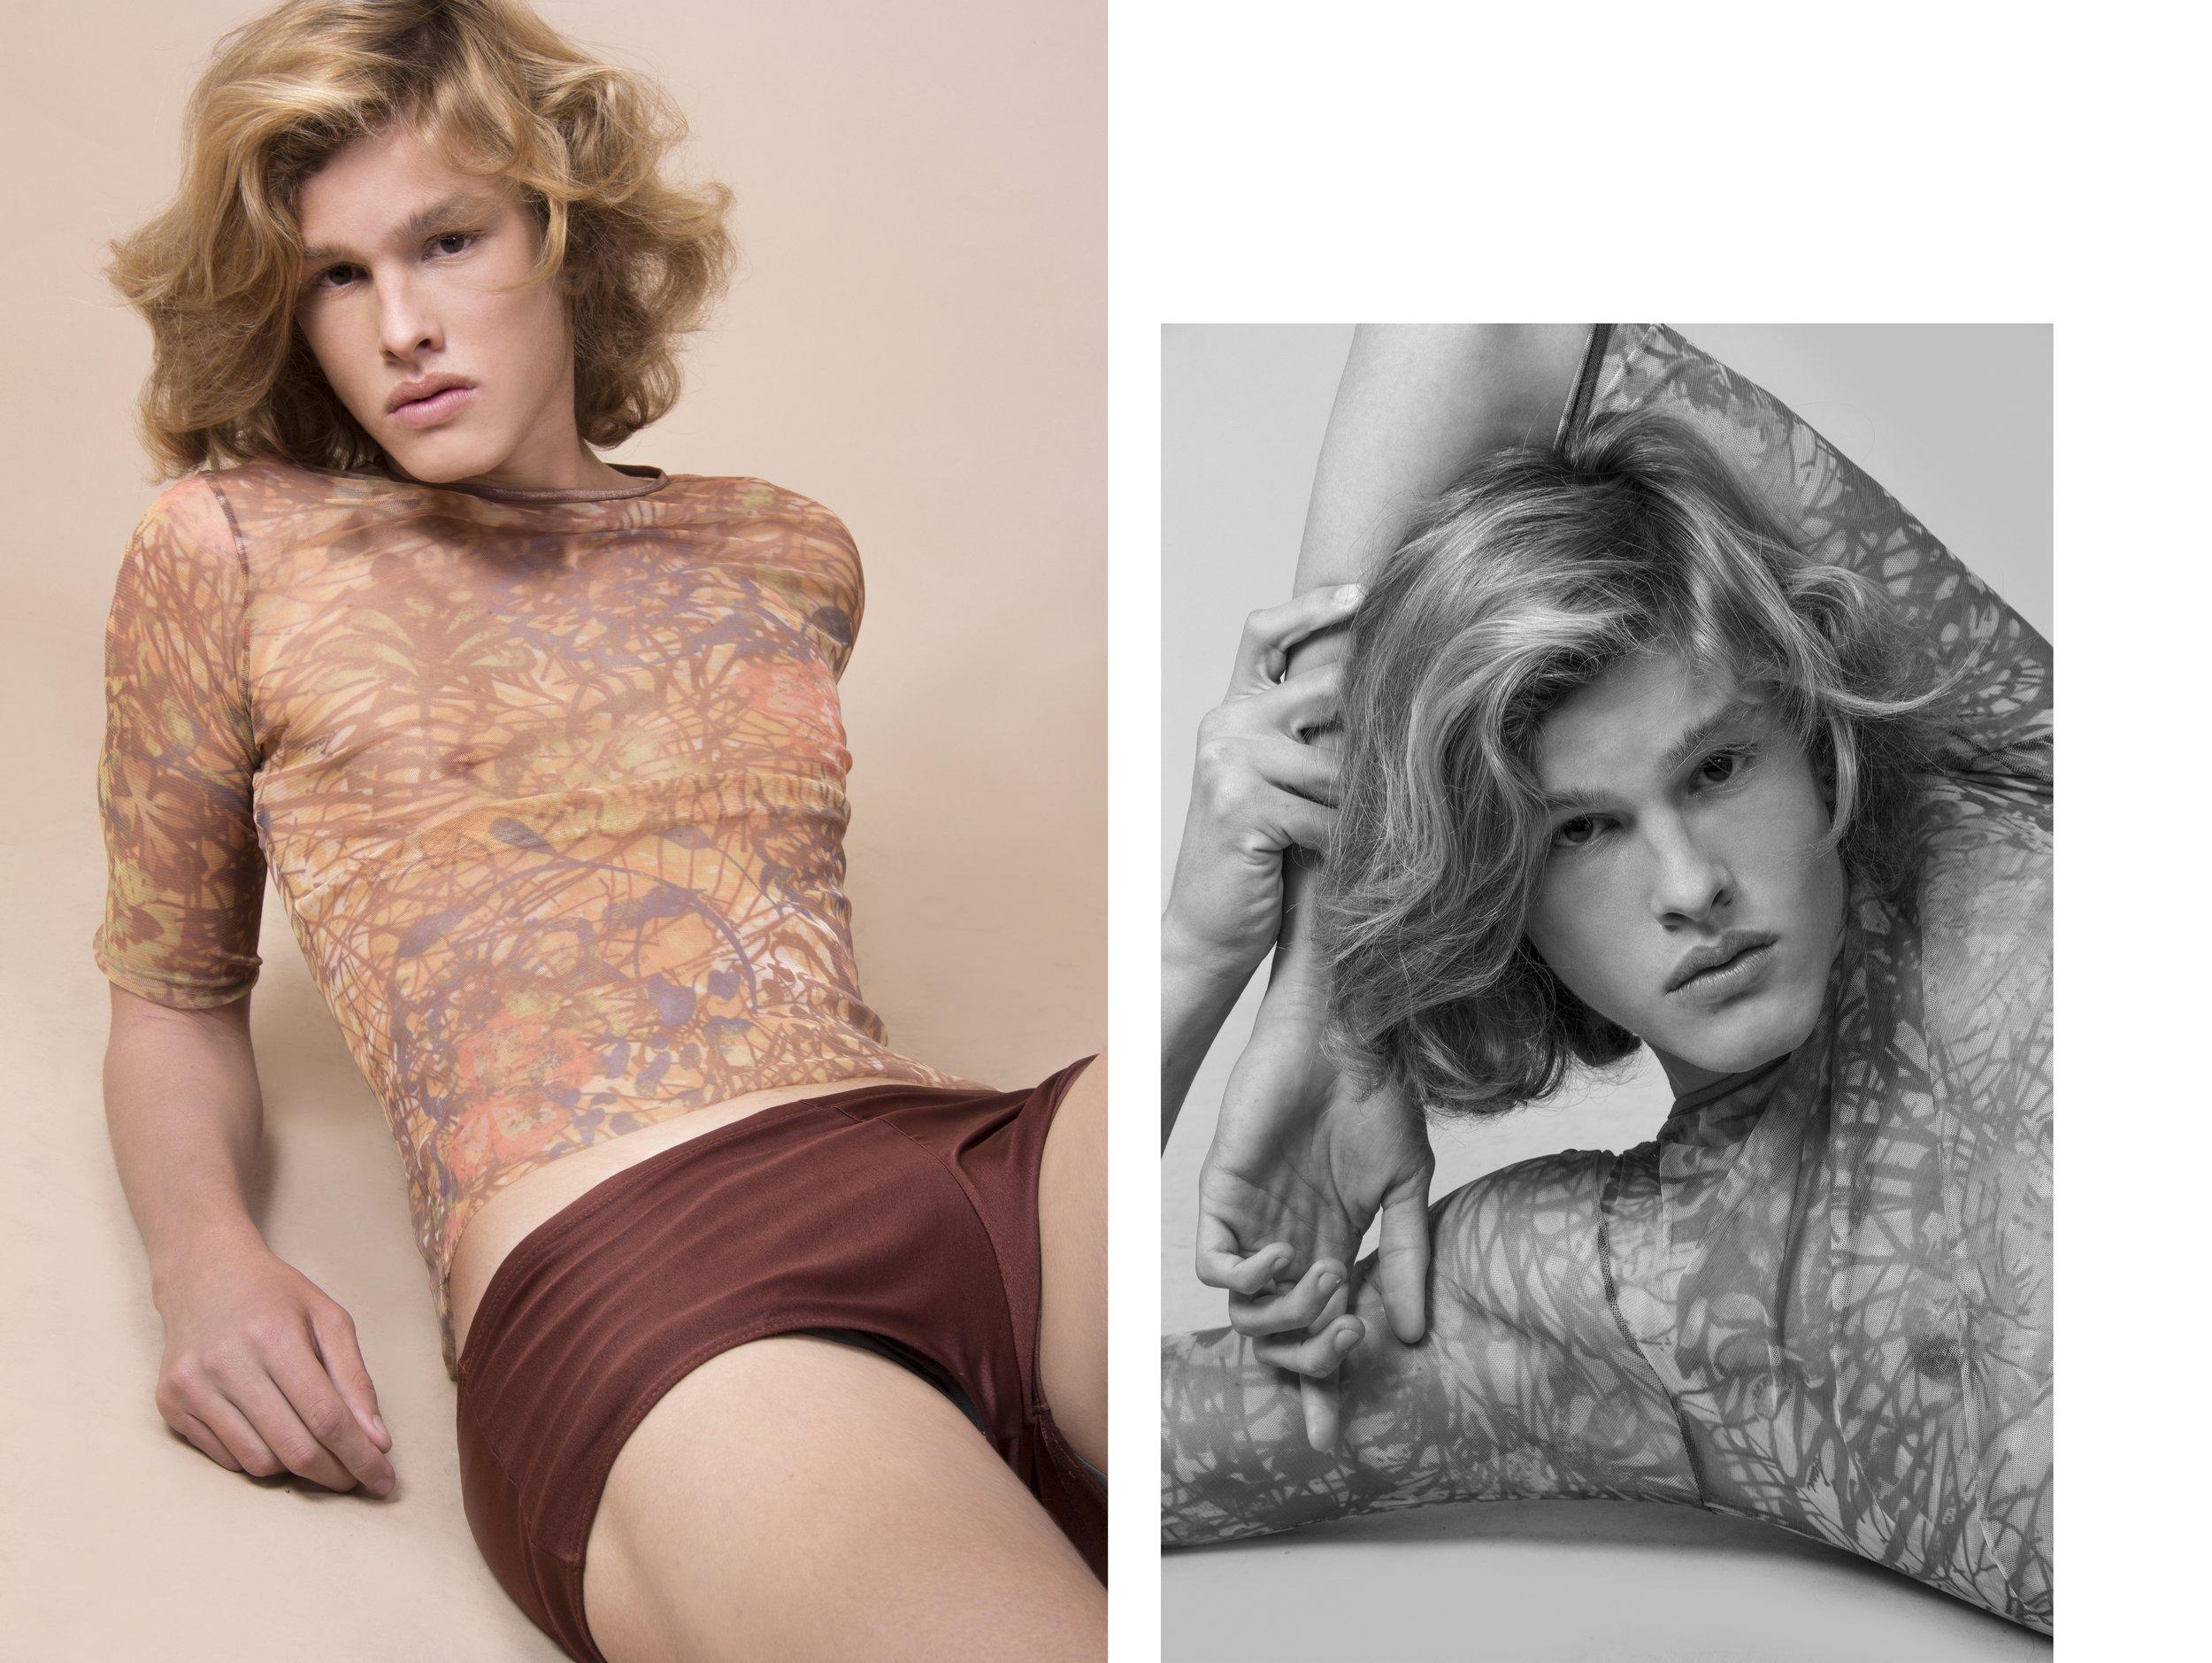 Cueca marrom Lanvin,blusa transparente acervo.